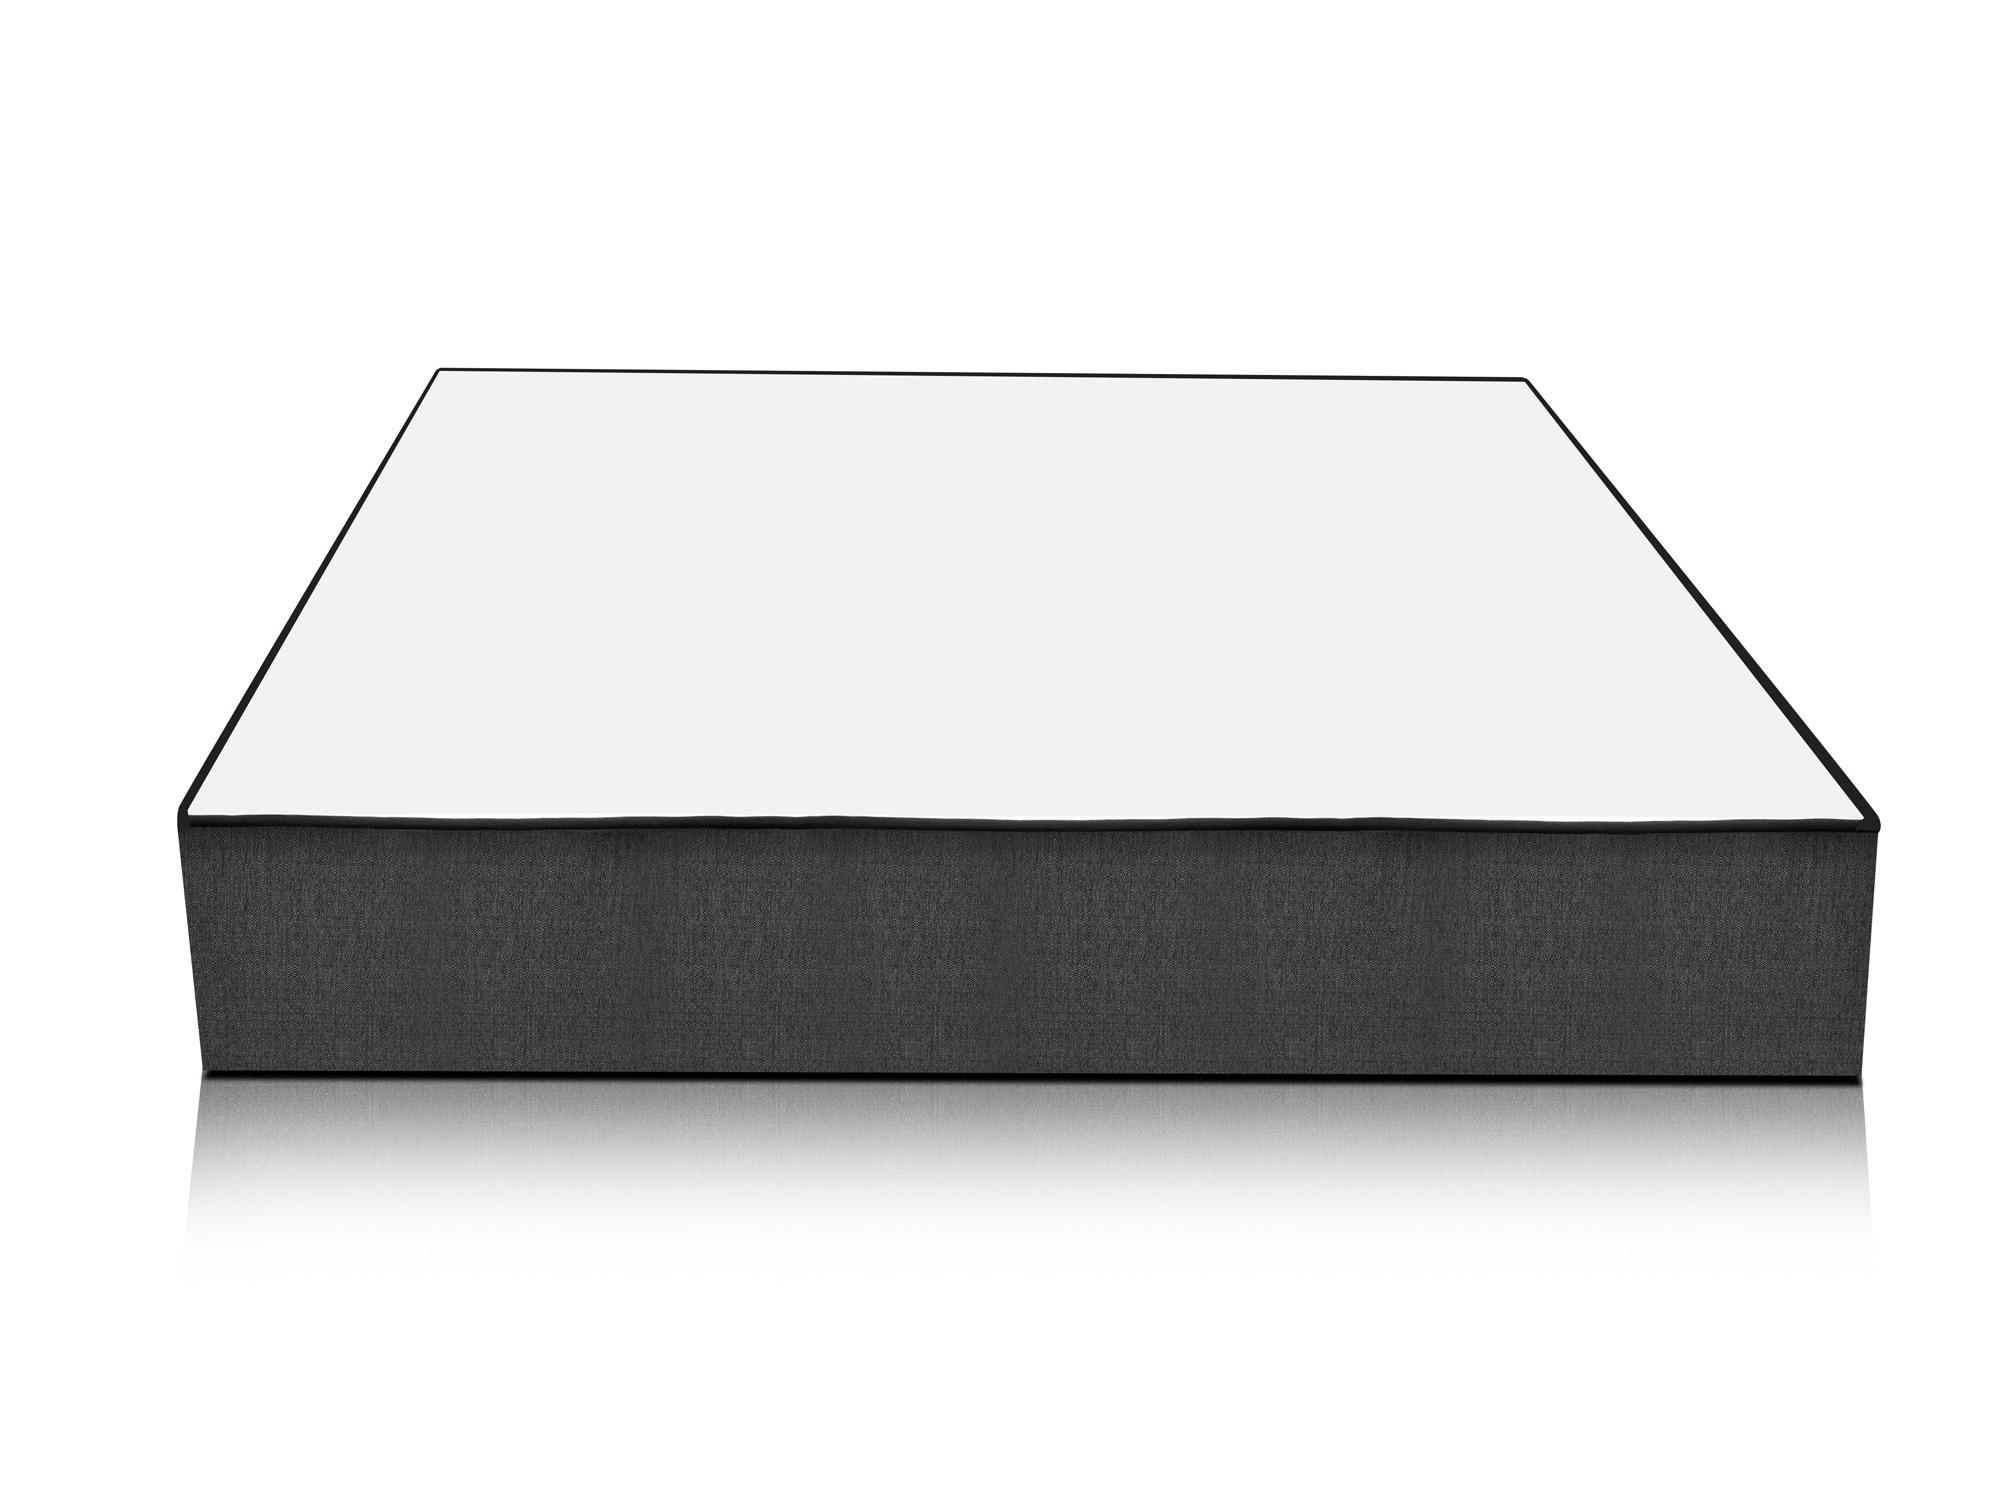 moody komfort matratze mit memory schaum 80 x 200 cm. Black Bedroom Furniture Sets. Home Design Ideas